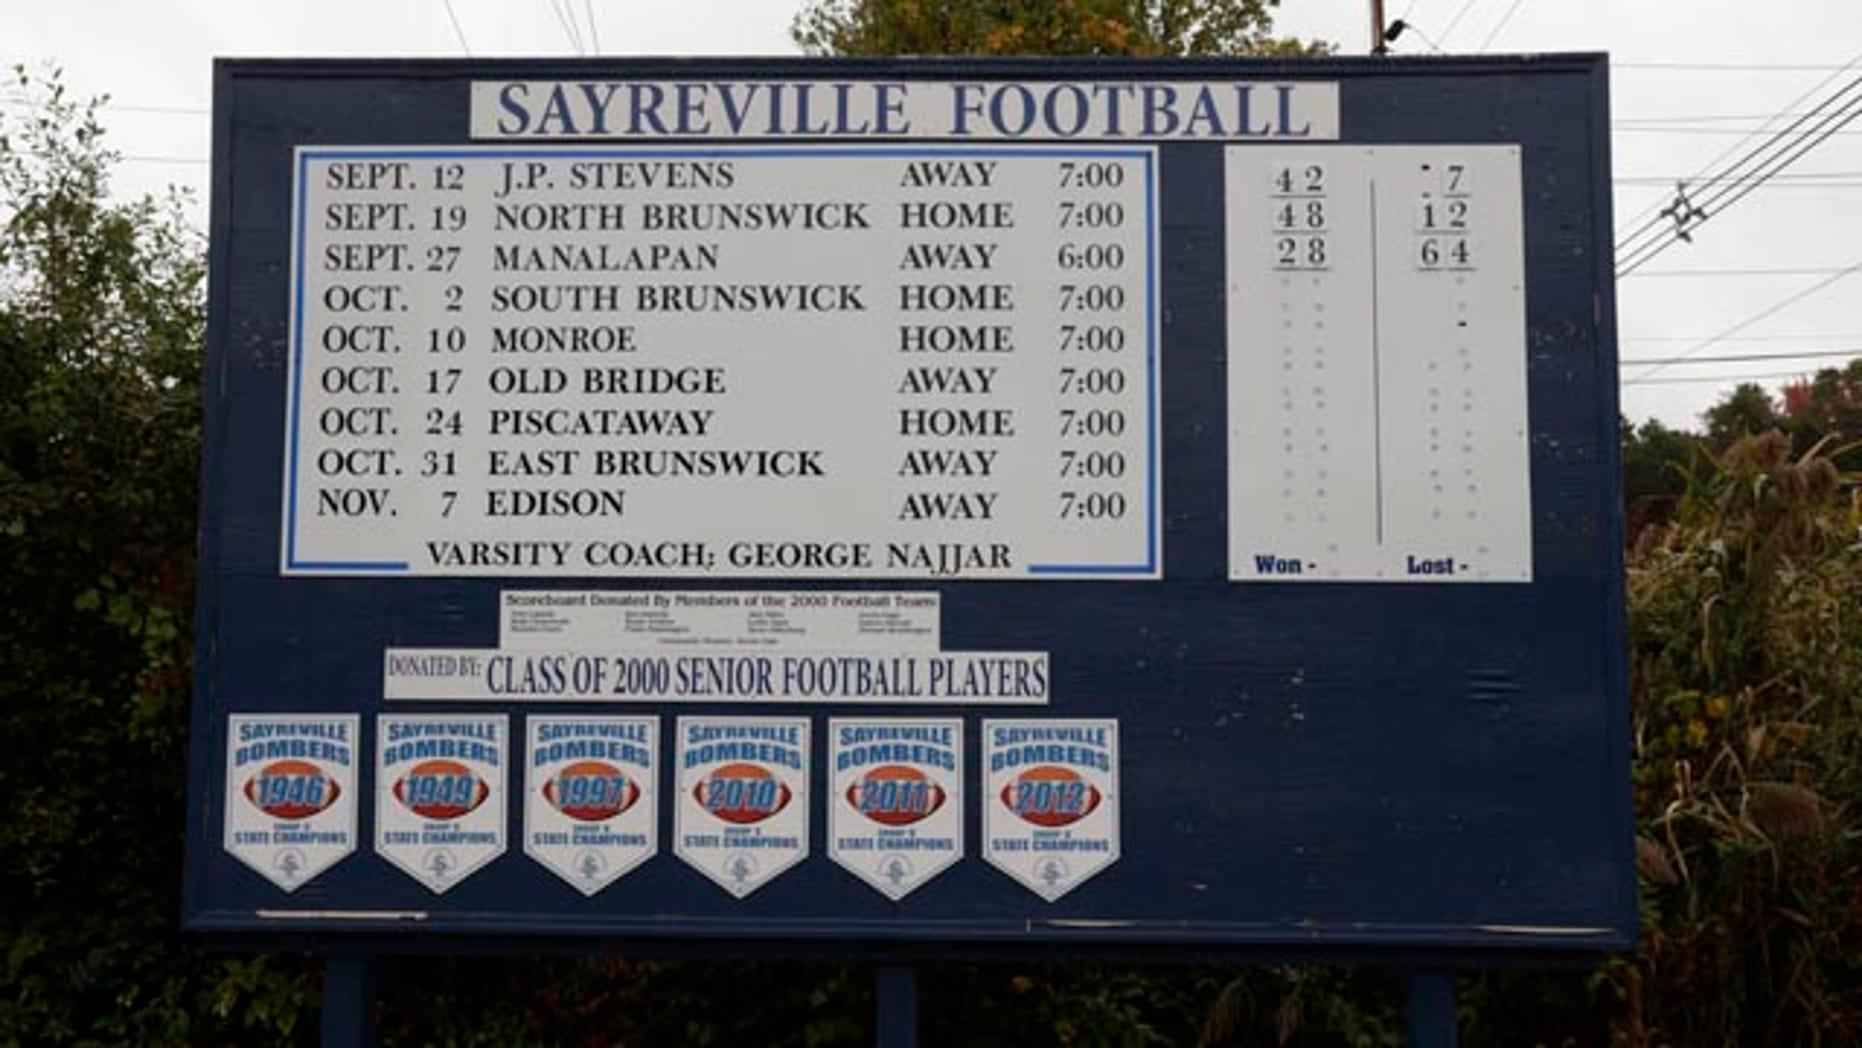 October 11, 2014: A roadside sign displays the Sayreville War Memorial High School football team schedule on Main Street in Sayreville, N.J. (AP Photo/Julio Cortez)